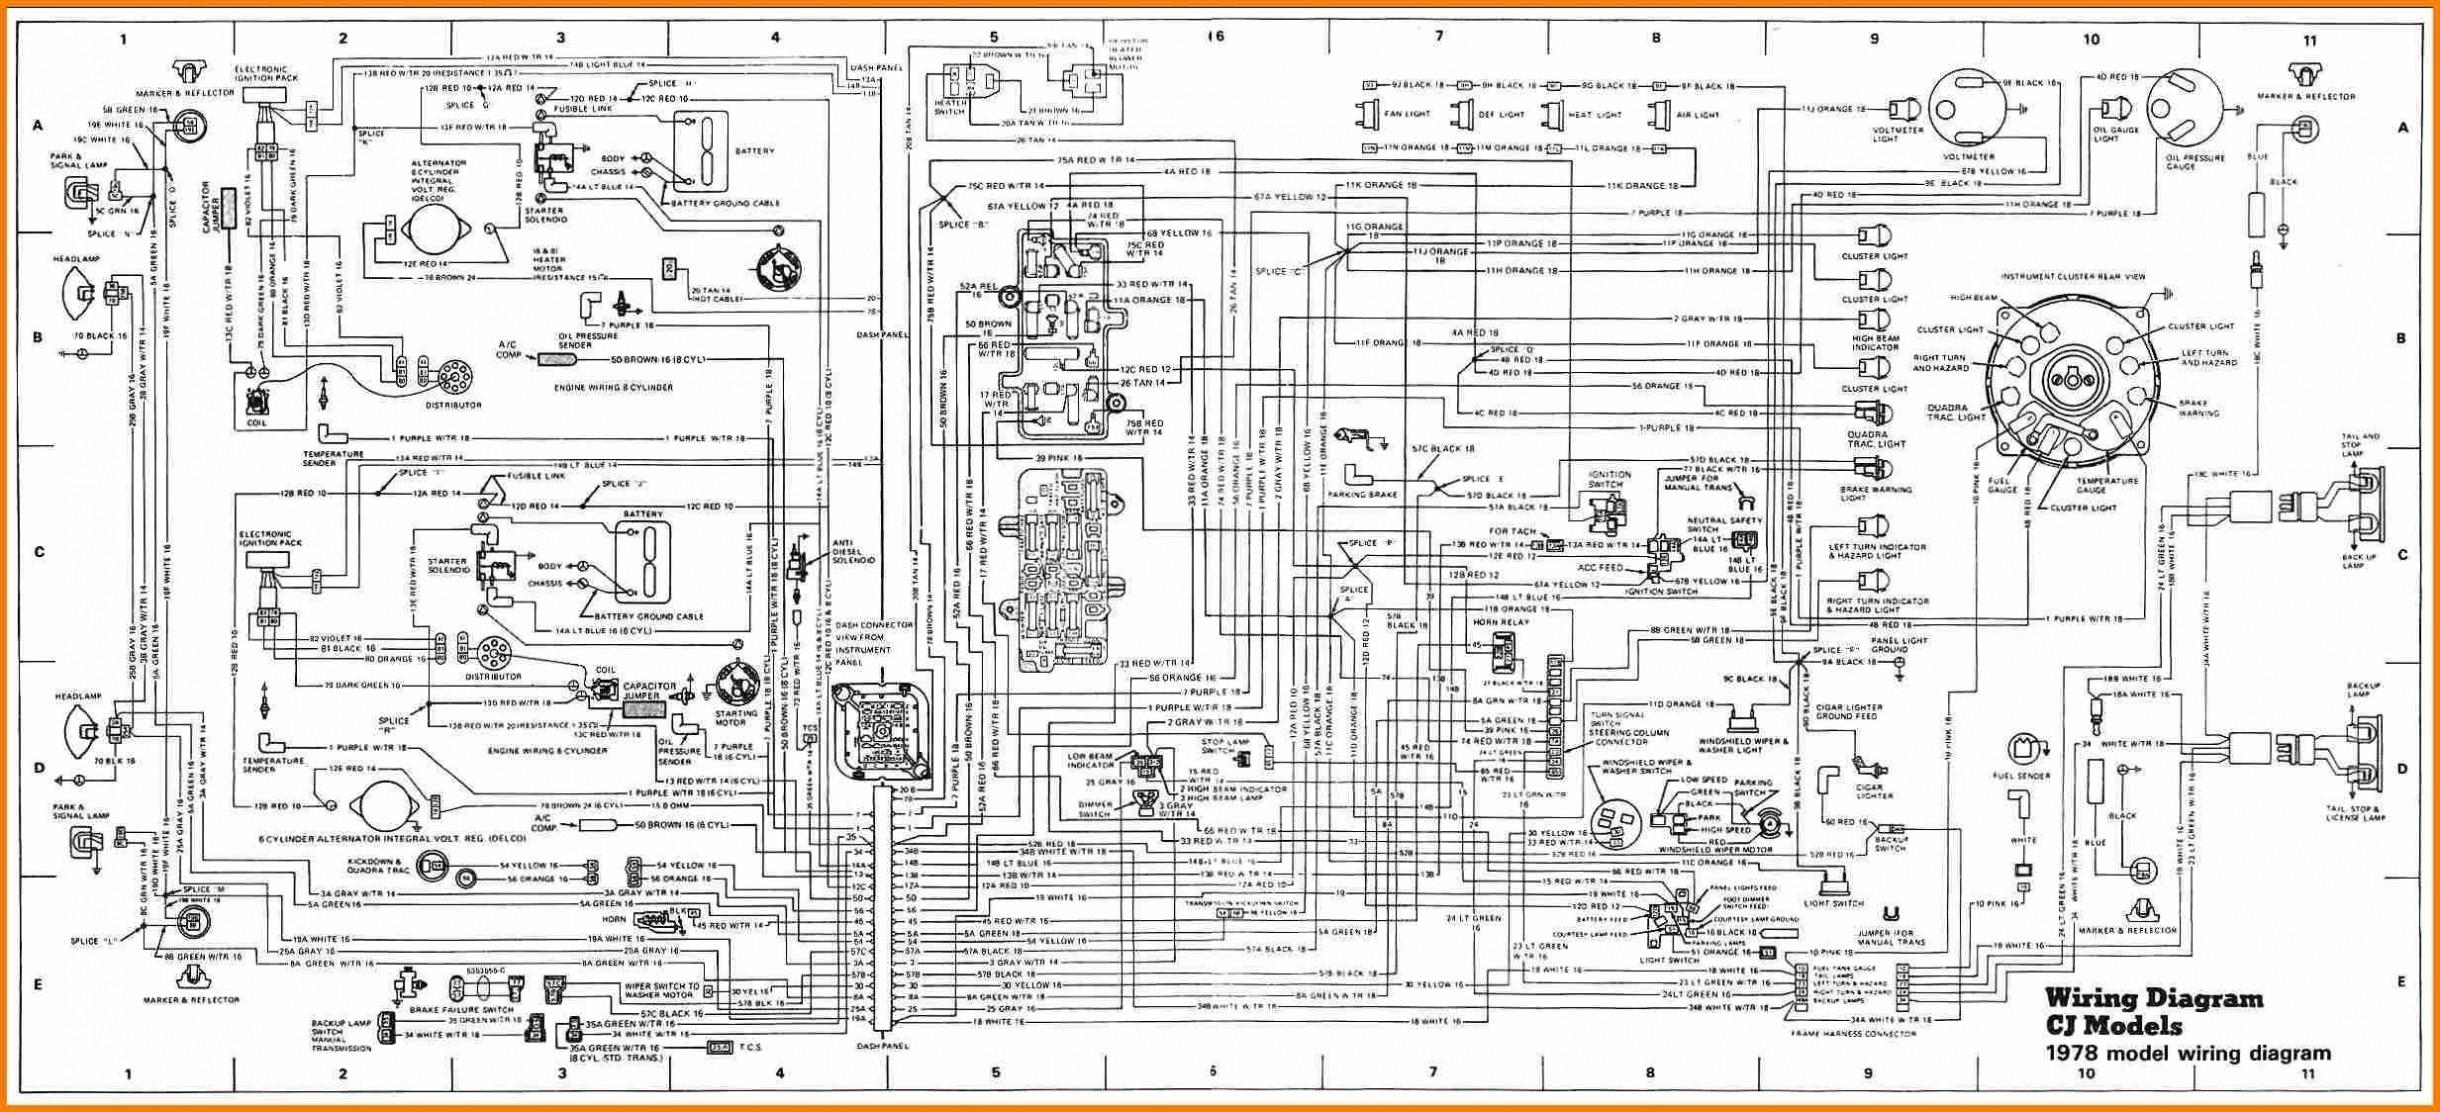 2005 Jeep Grand Cherokee Fuse Diagram 2005 Jeep Grand Cherokee Headlight Wiring Diagram Wiring Diagrams